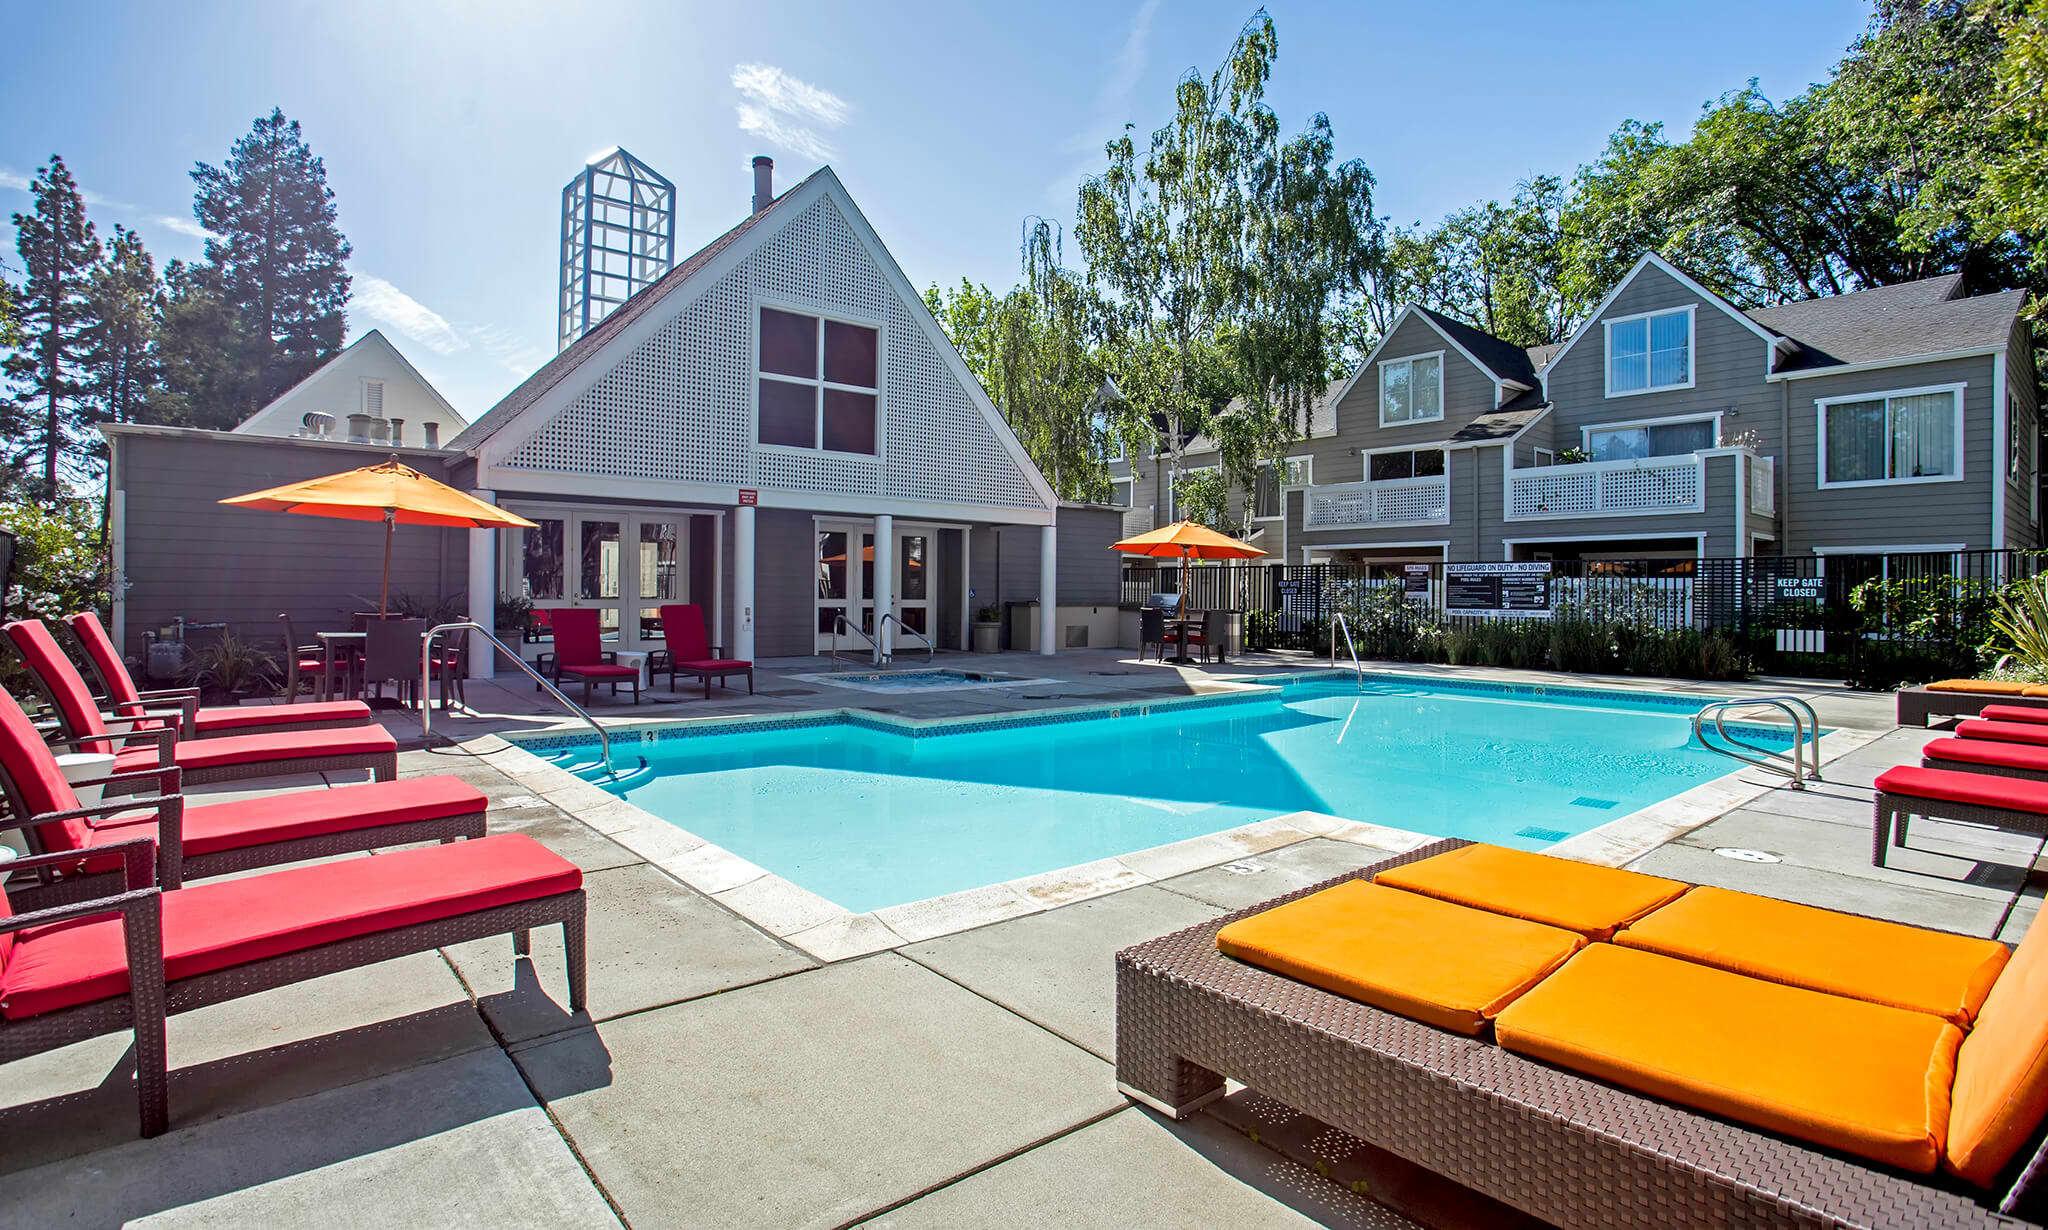 Alderwood Apartments apartments in Santa Clara CA to rent photo 1